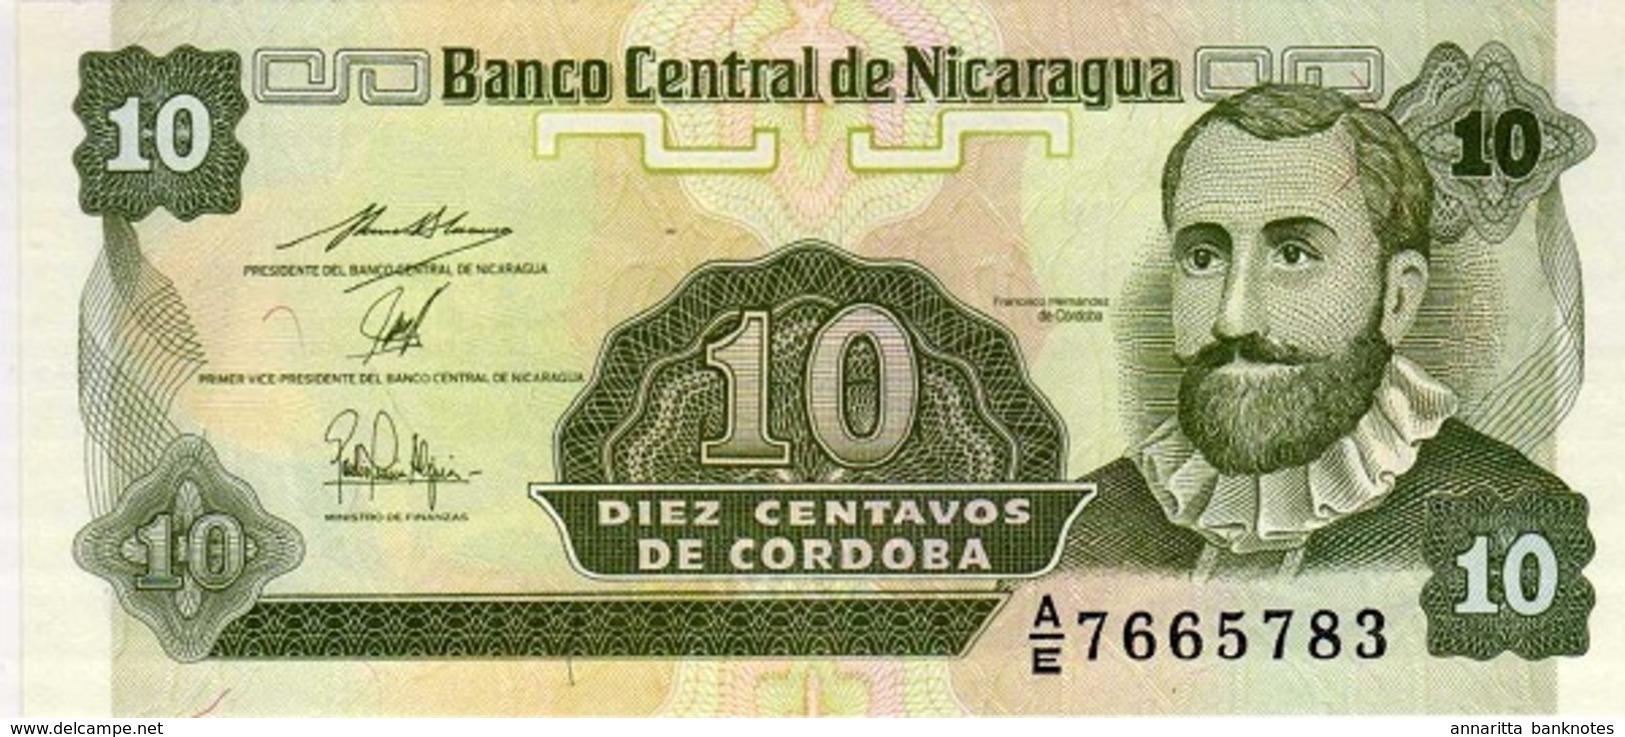 NICARAGUA 10 CENTAVOS ND (1990) P-169 NEUF PRÉFIXE A/E [NI463b] - Nicaragua